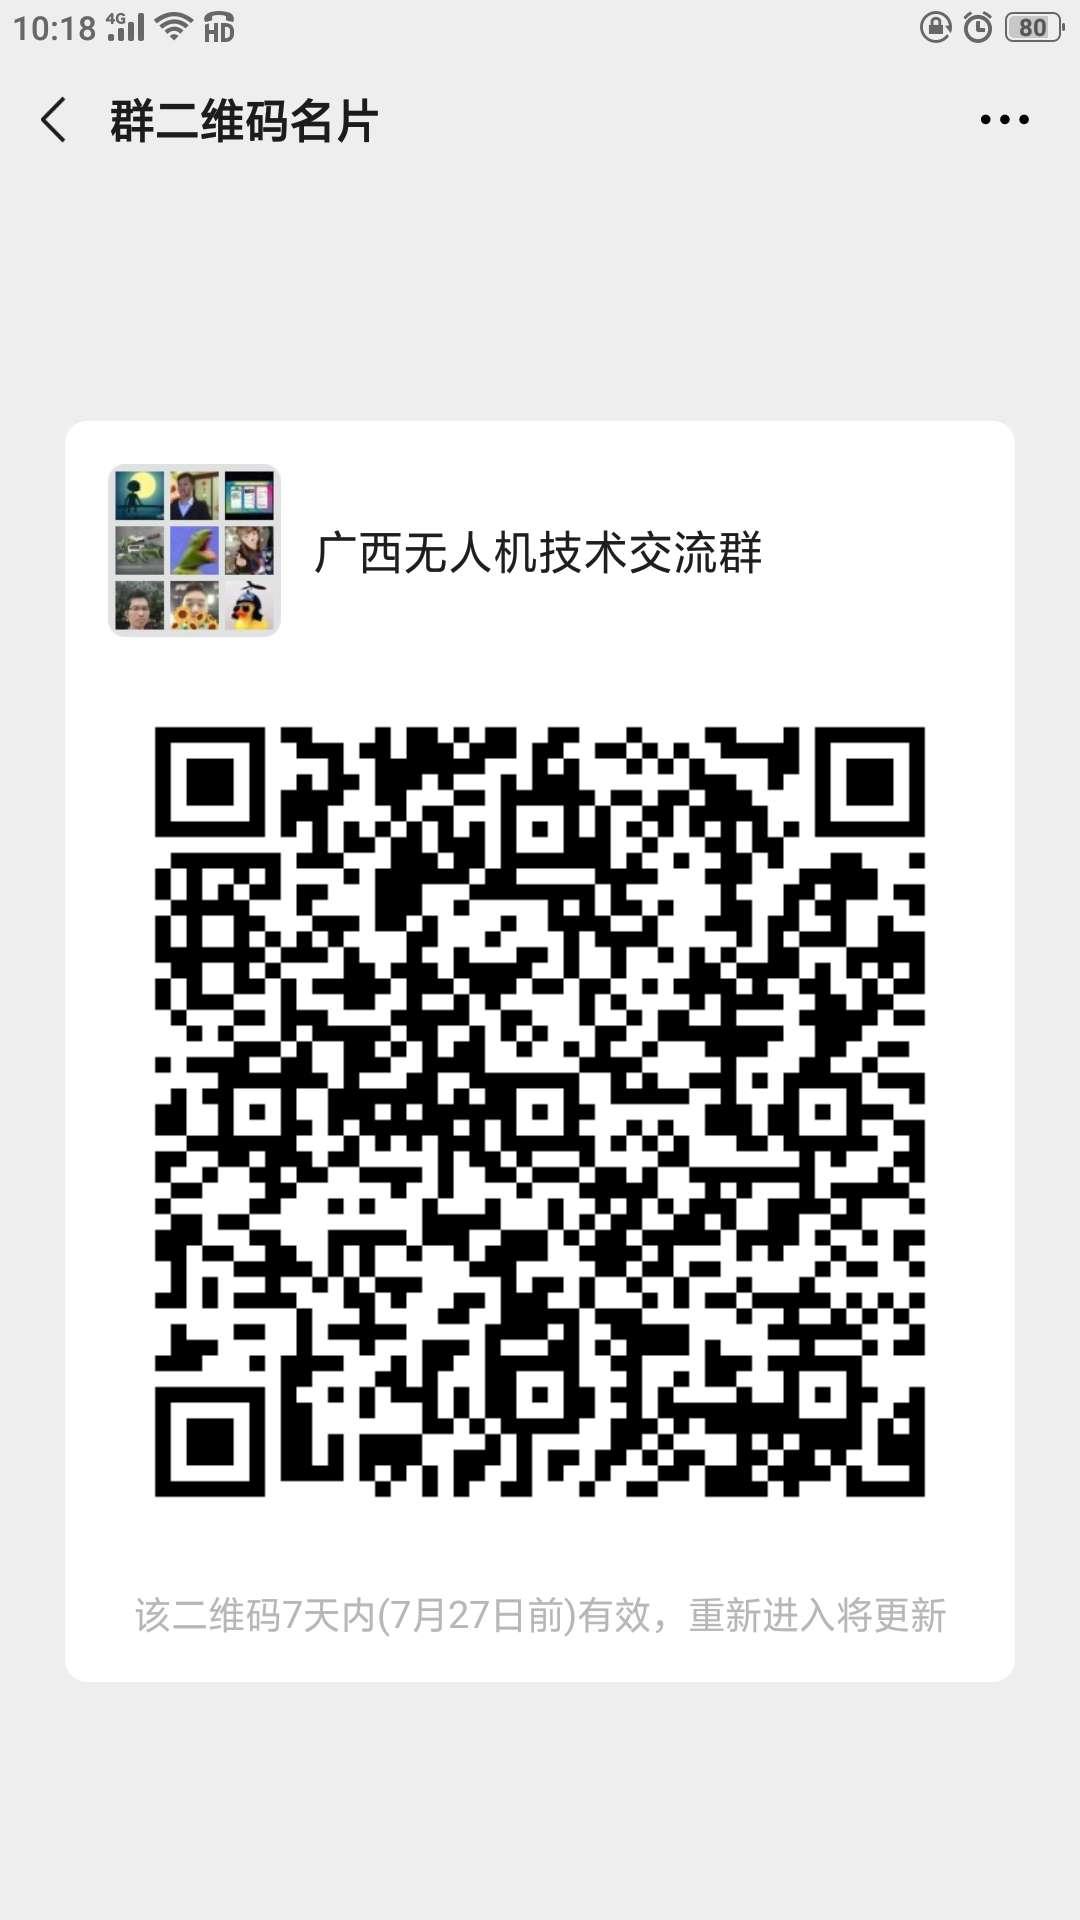 79d7784fcb7aee18d160ac8297cfbf1.jpg